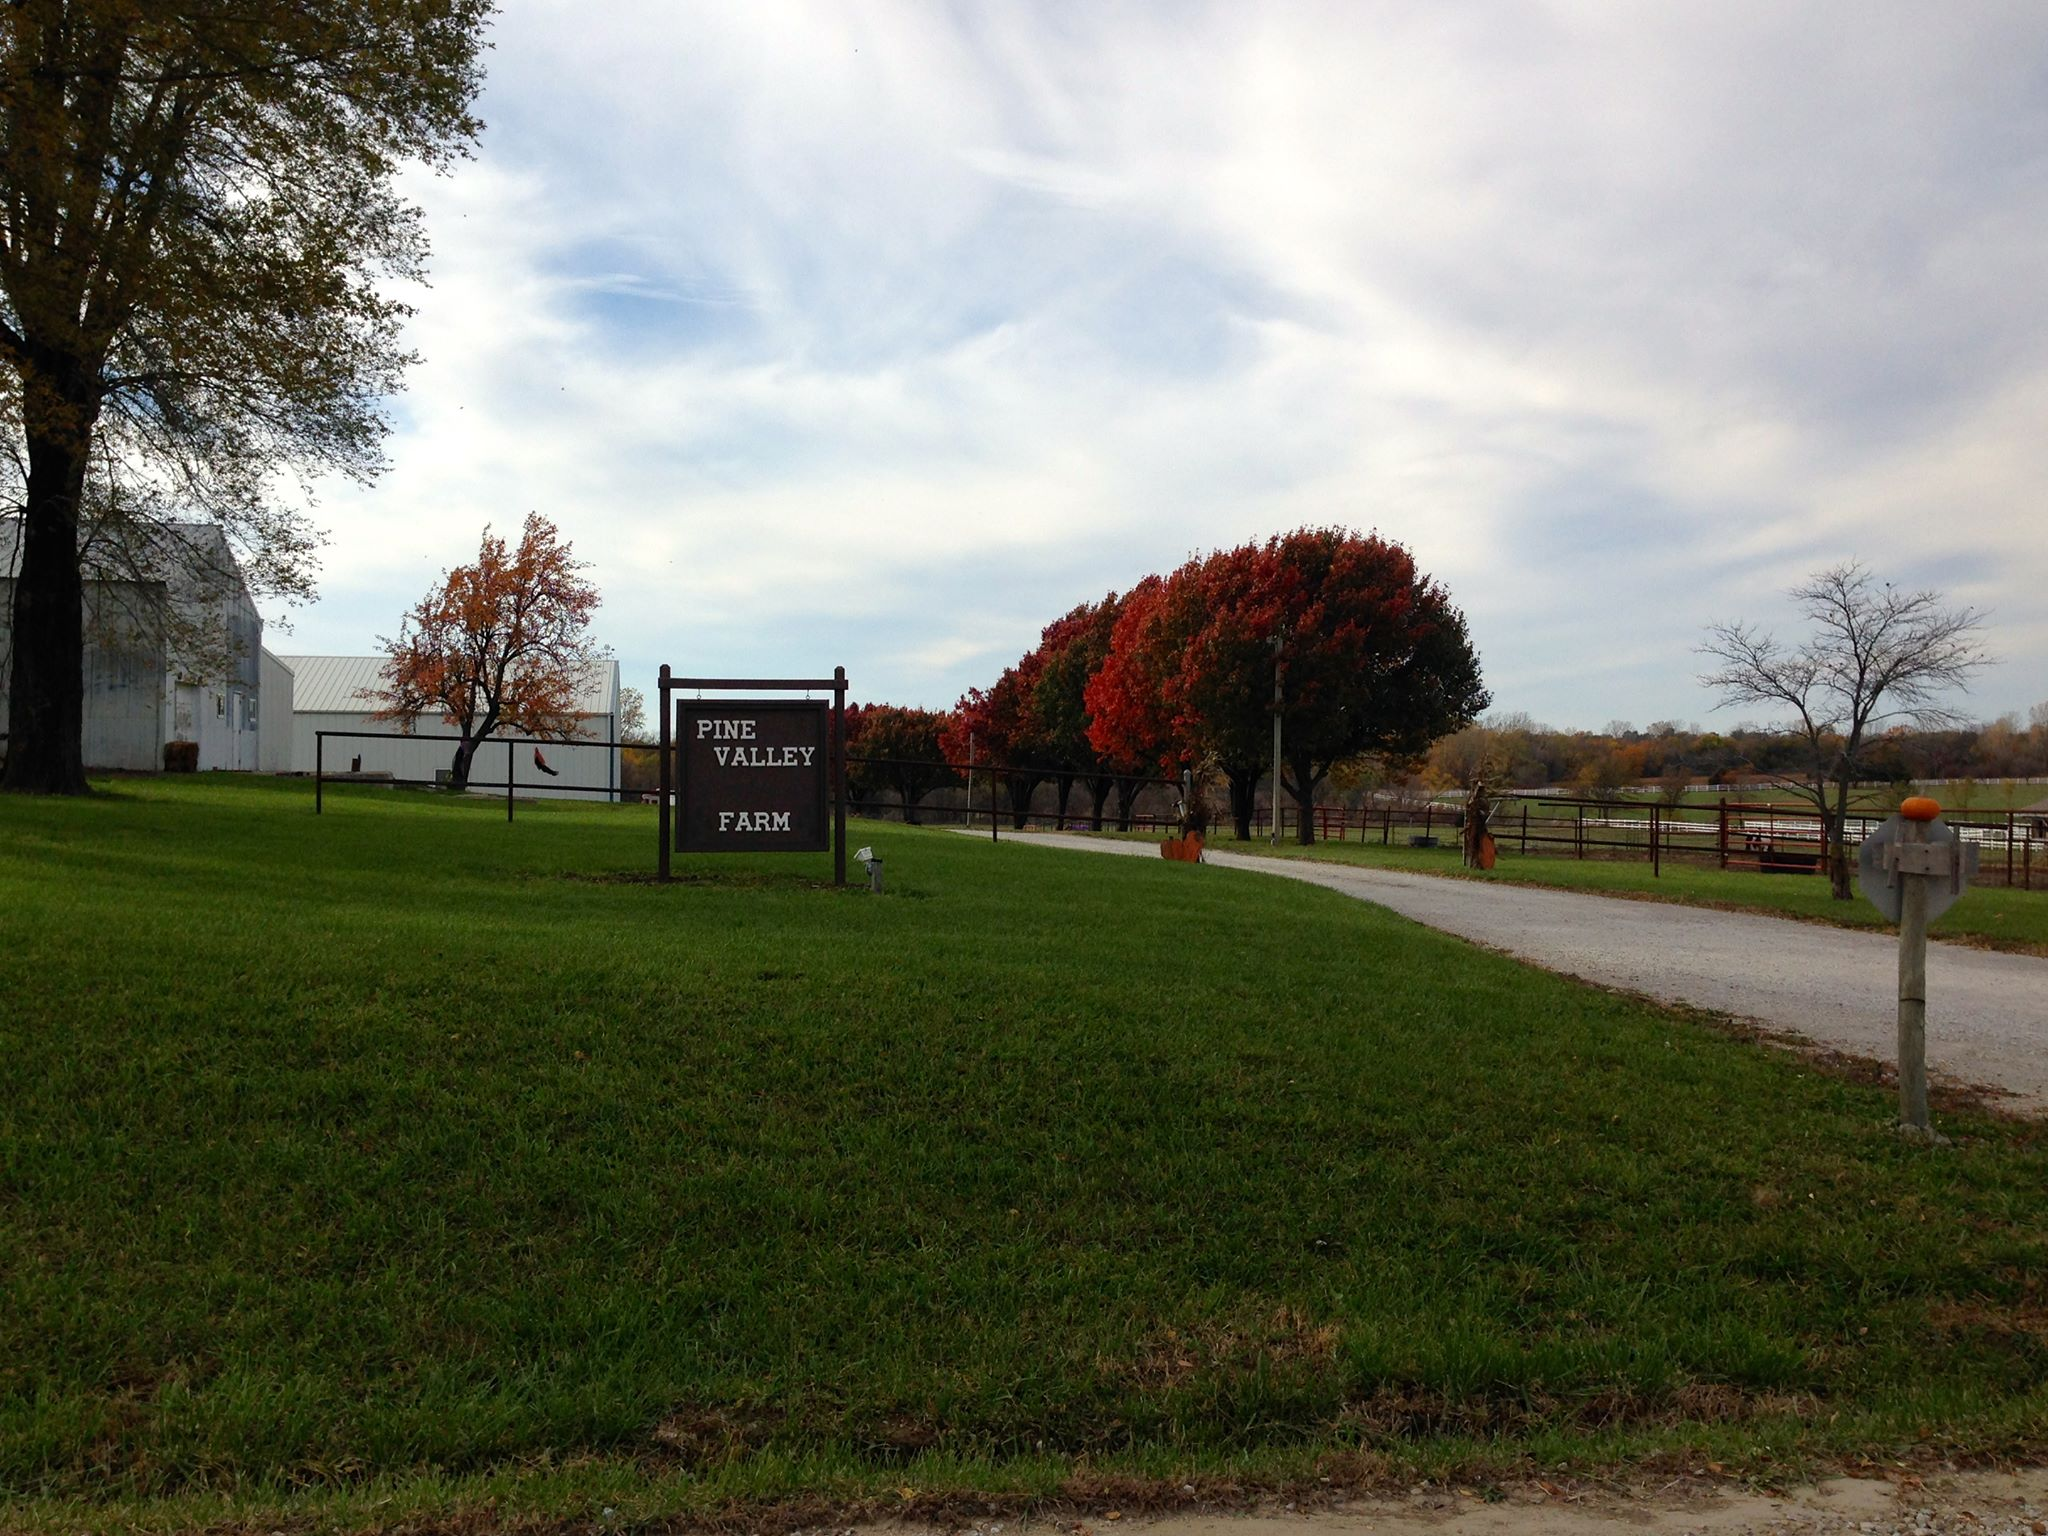 Pine Valley Farm - Recreation - Kansas City - Bucyrus